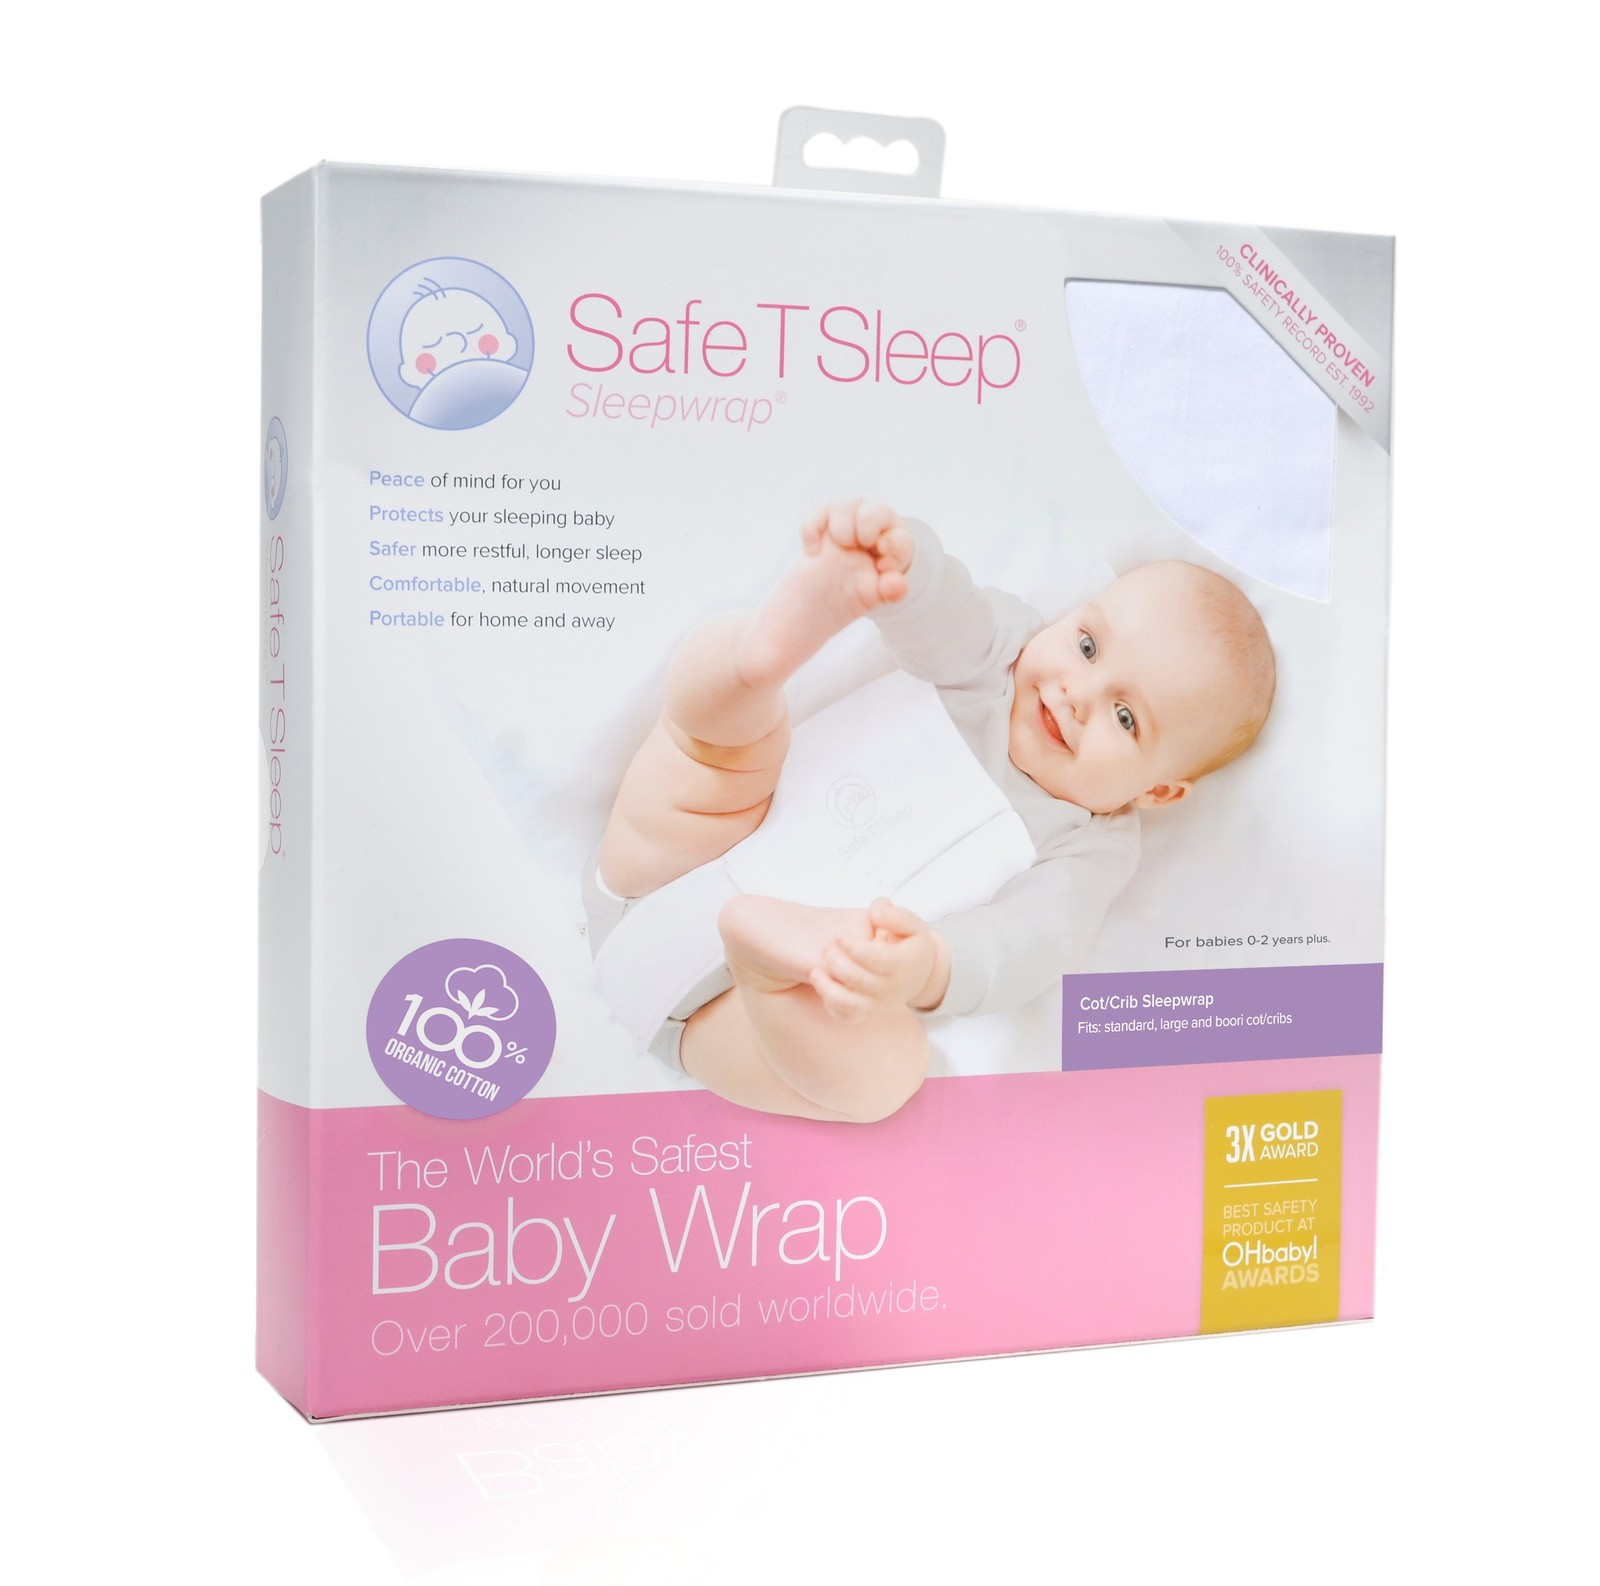 Safe T Sleep Sleepwrap - Cot/Crib image